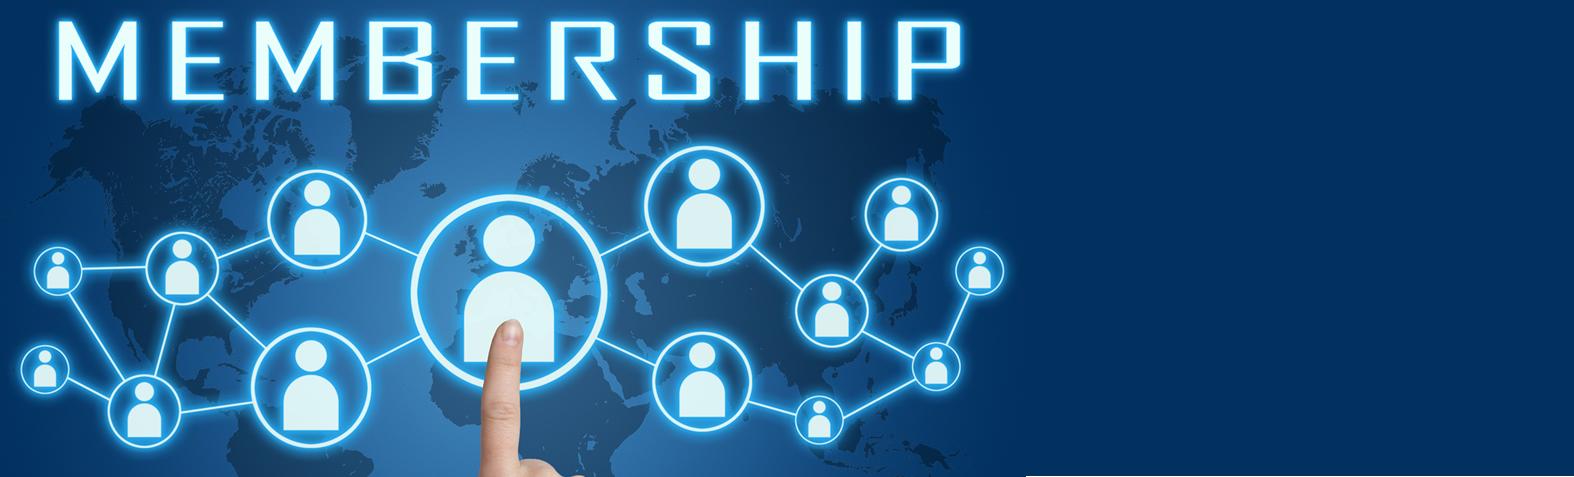 Membership-image2